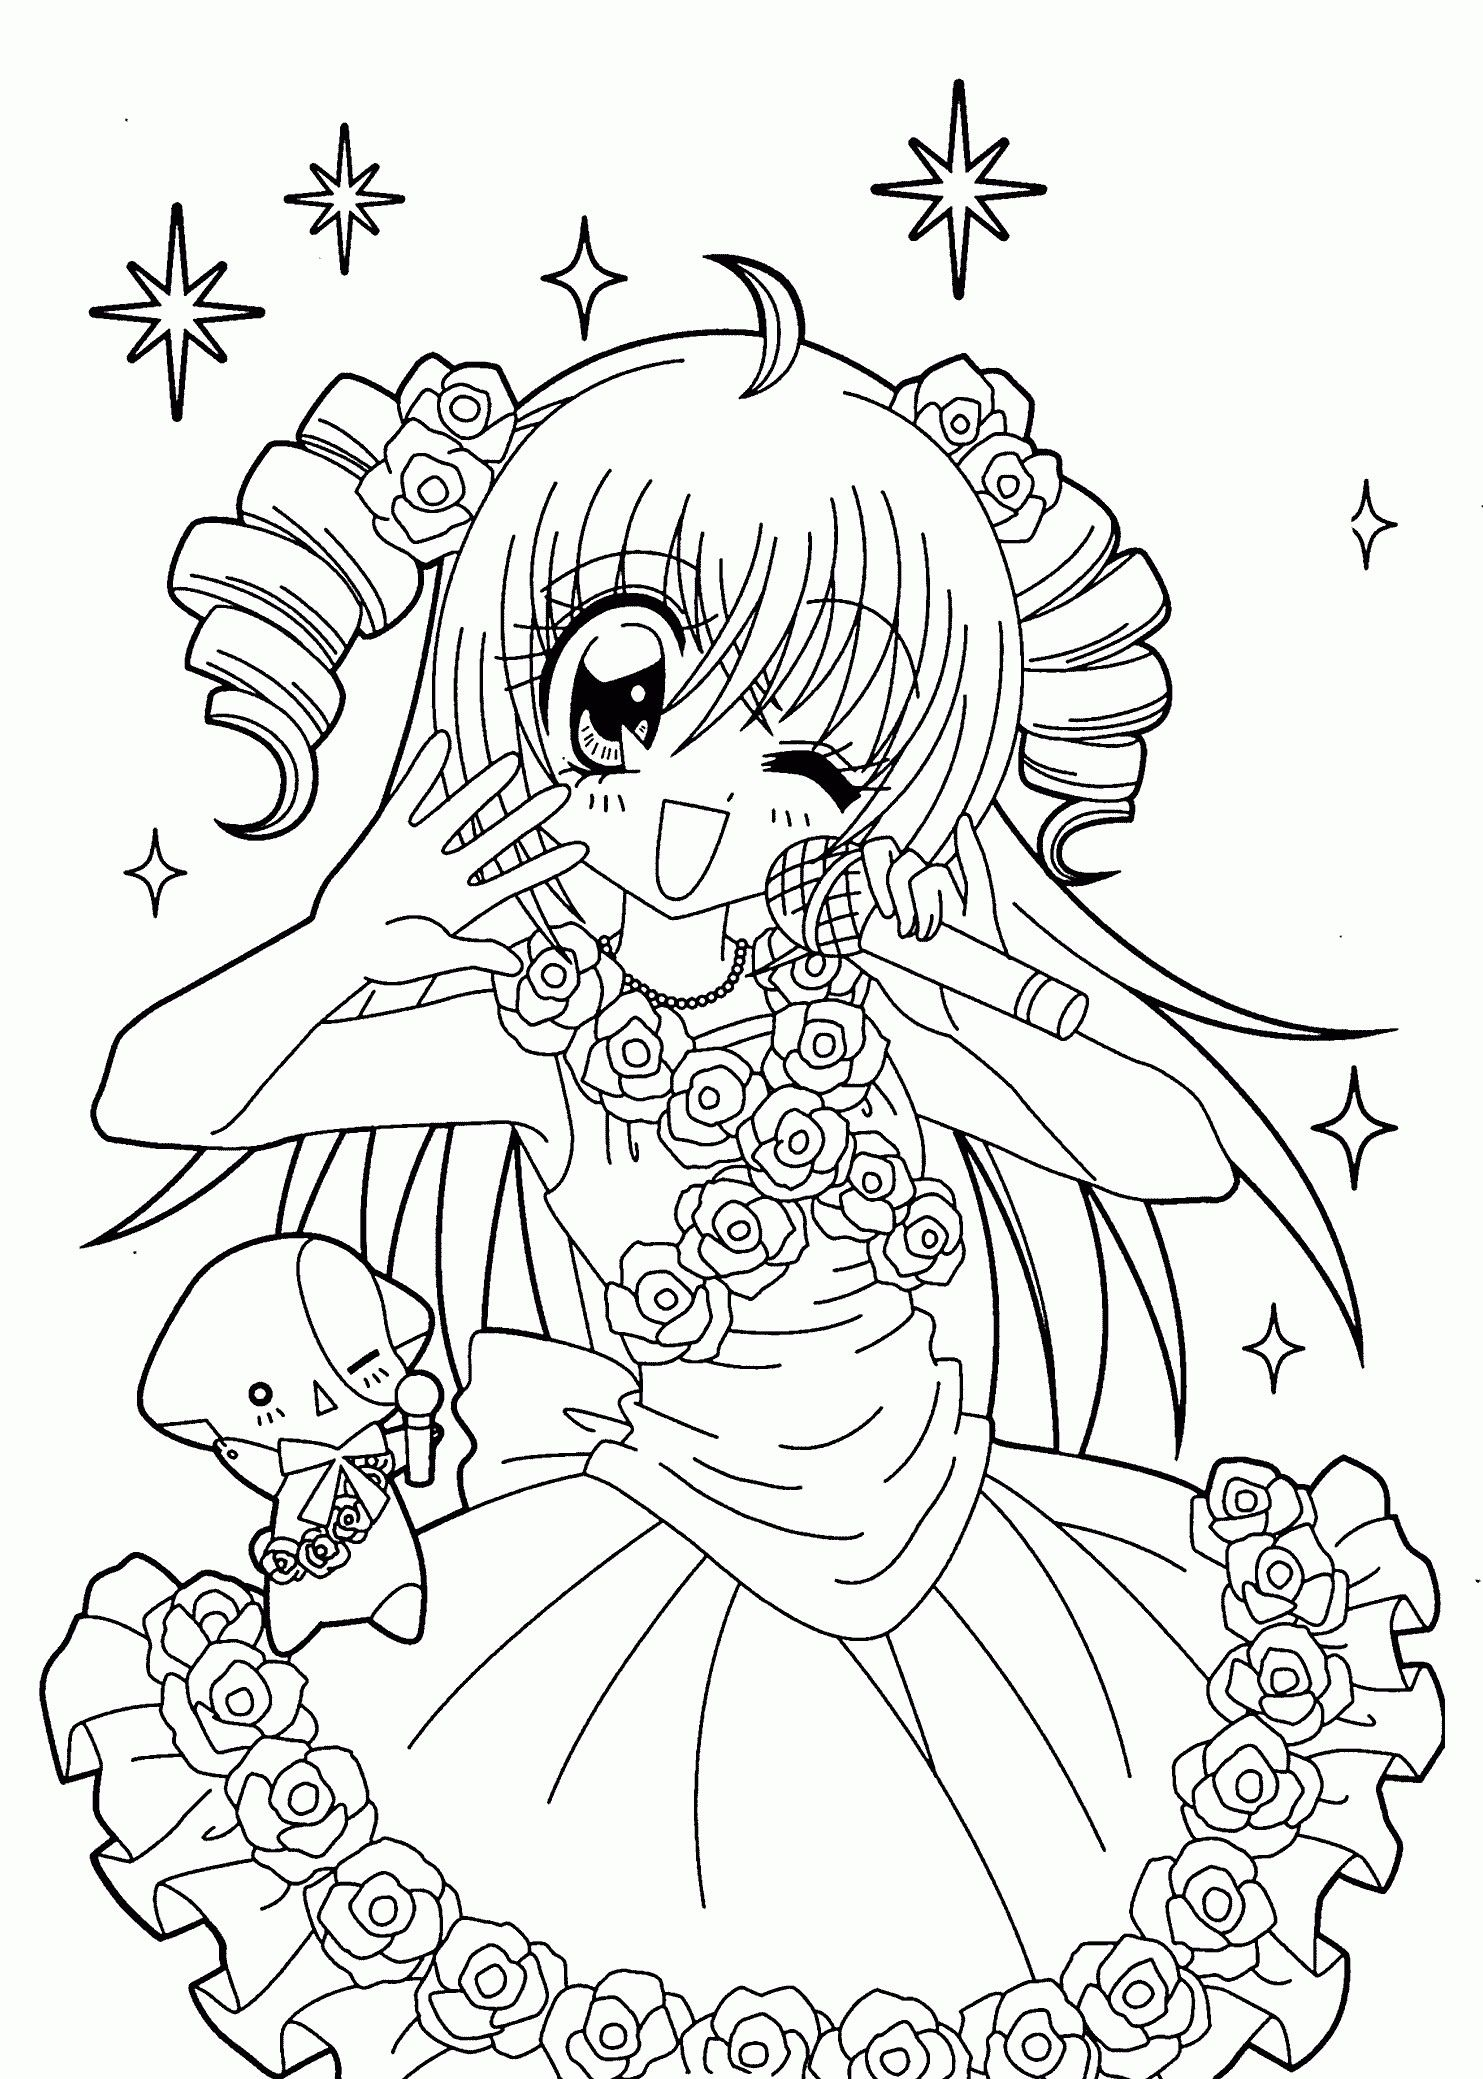 Coloring Drawing Kilari Manga Print For Coloring Page Print Coloriage Mystere Disney Coloriage Coloriage Manga